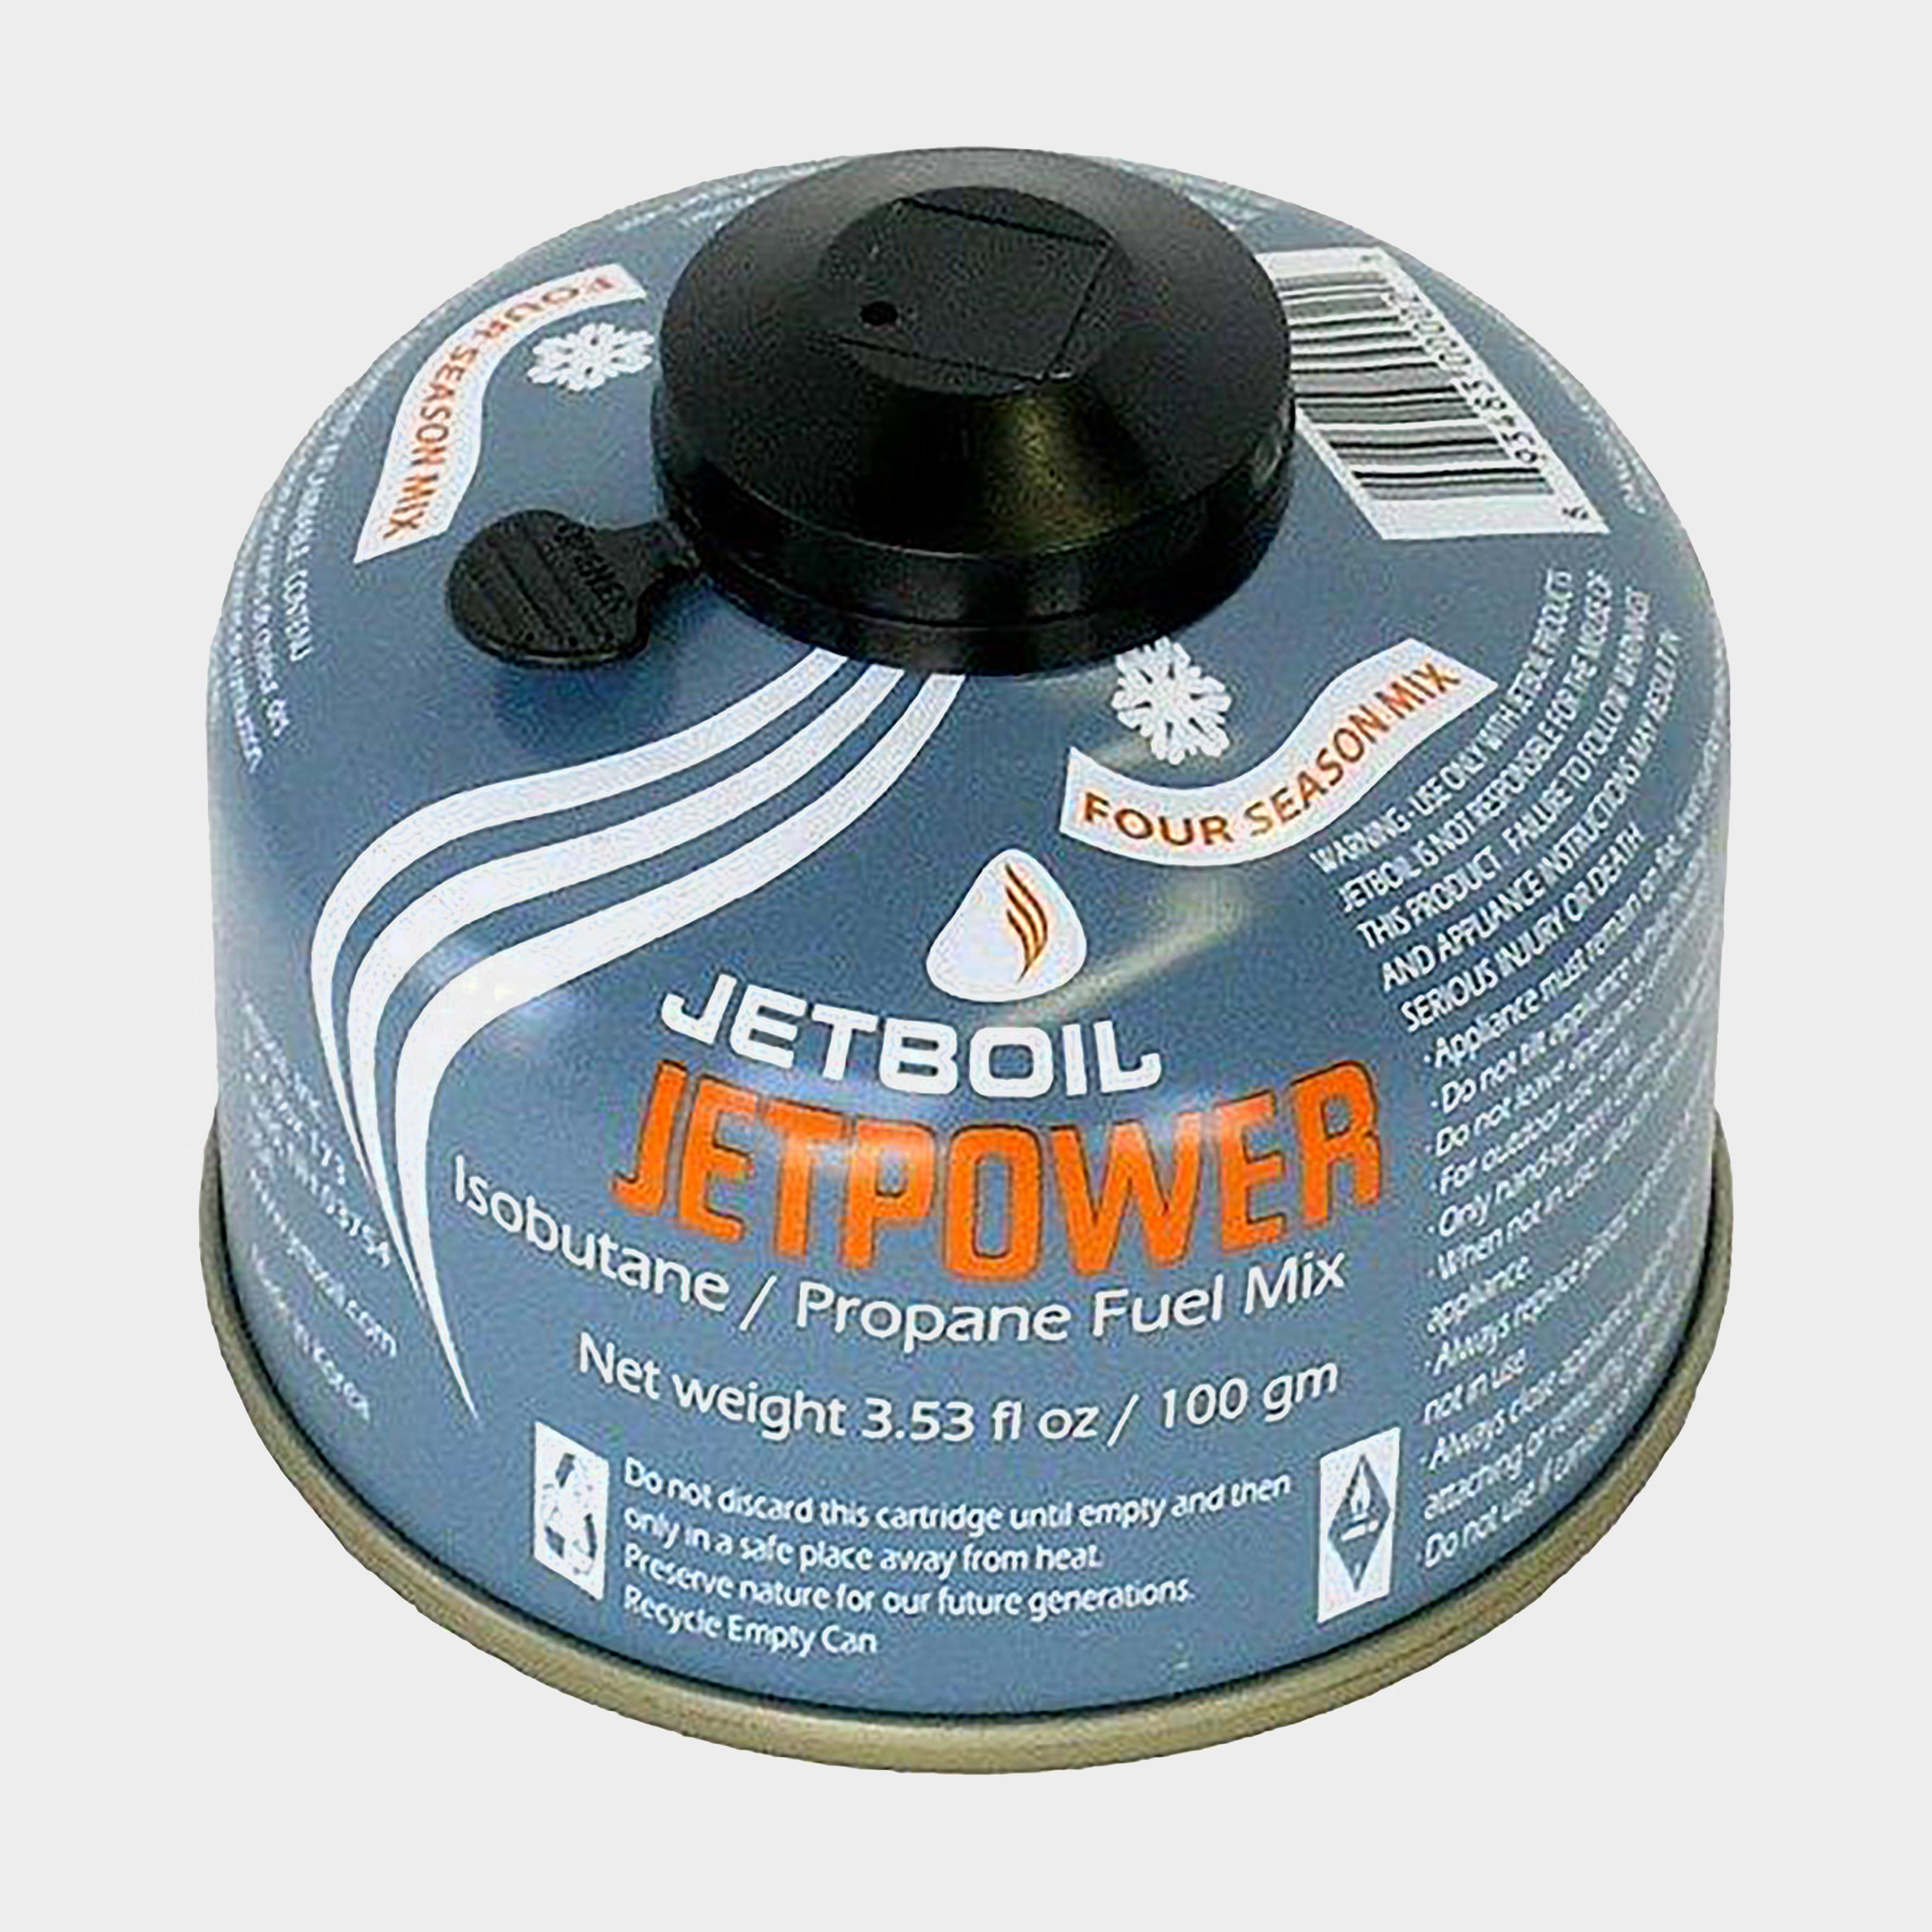 Jetboil Jetpower 100g Fuel Canister - Blue  Blue